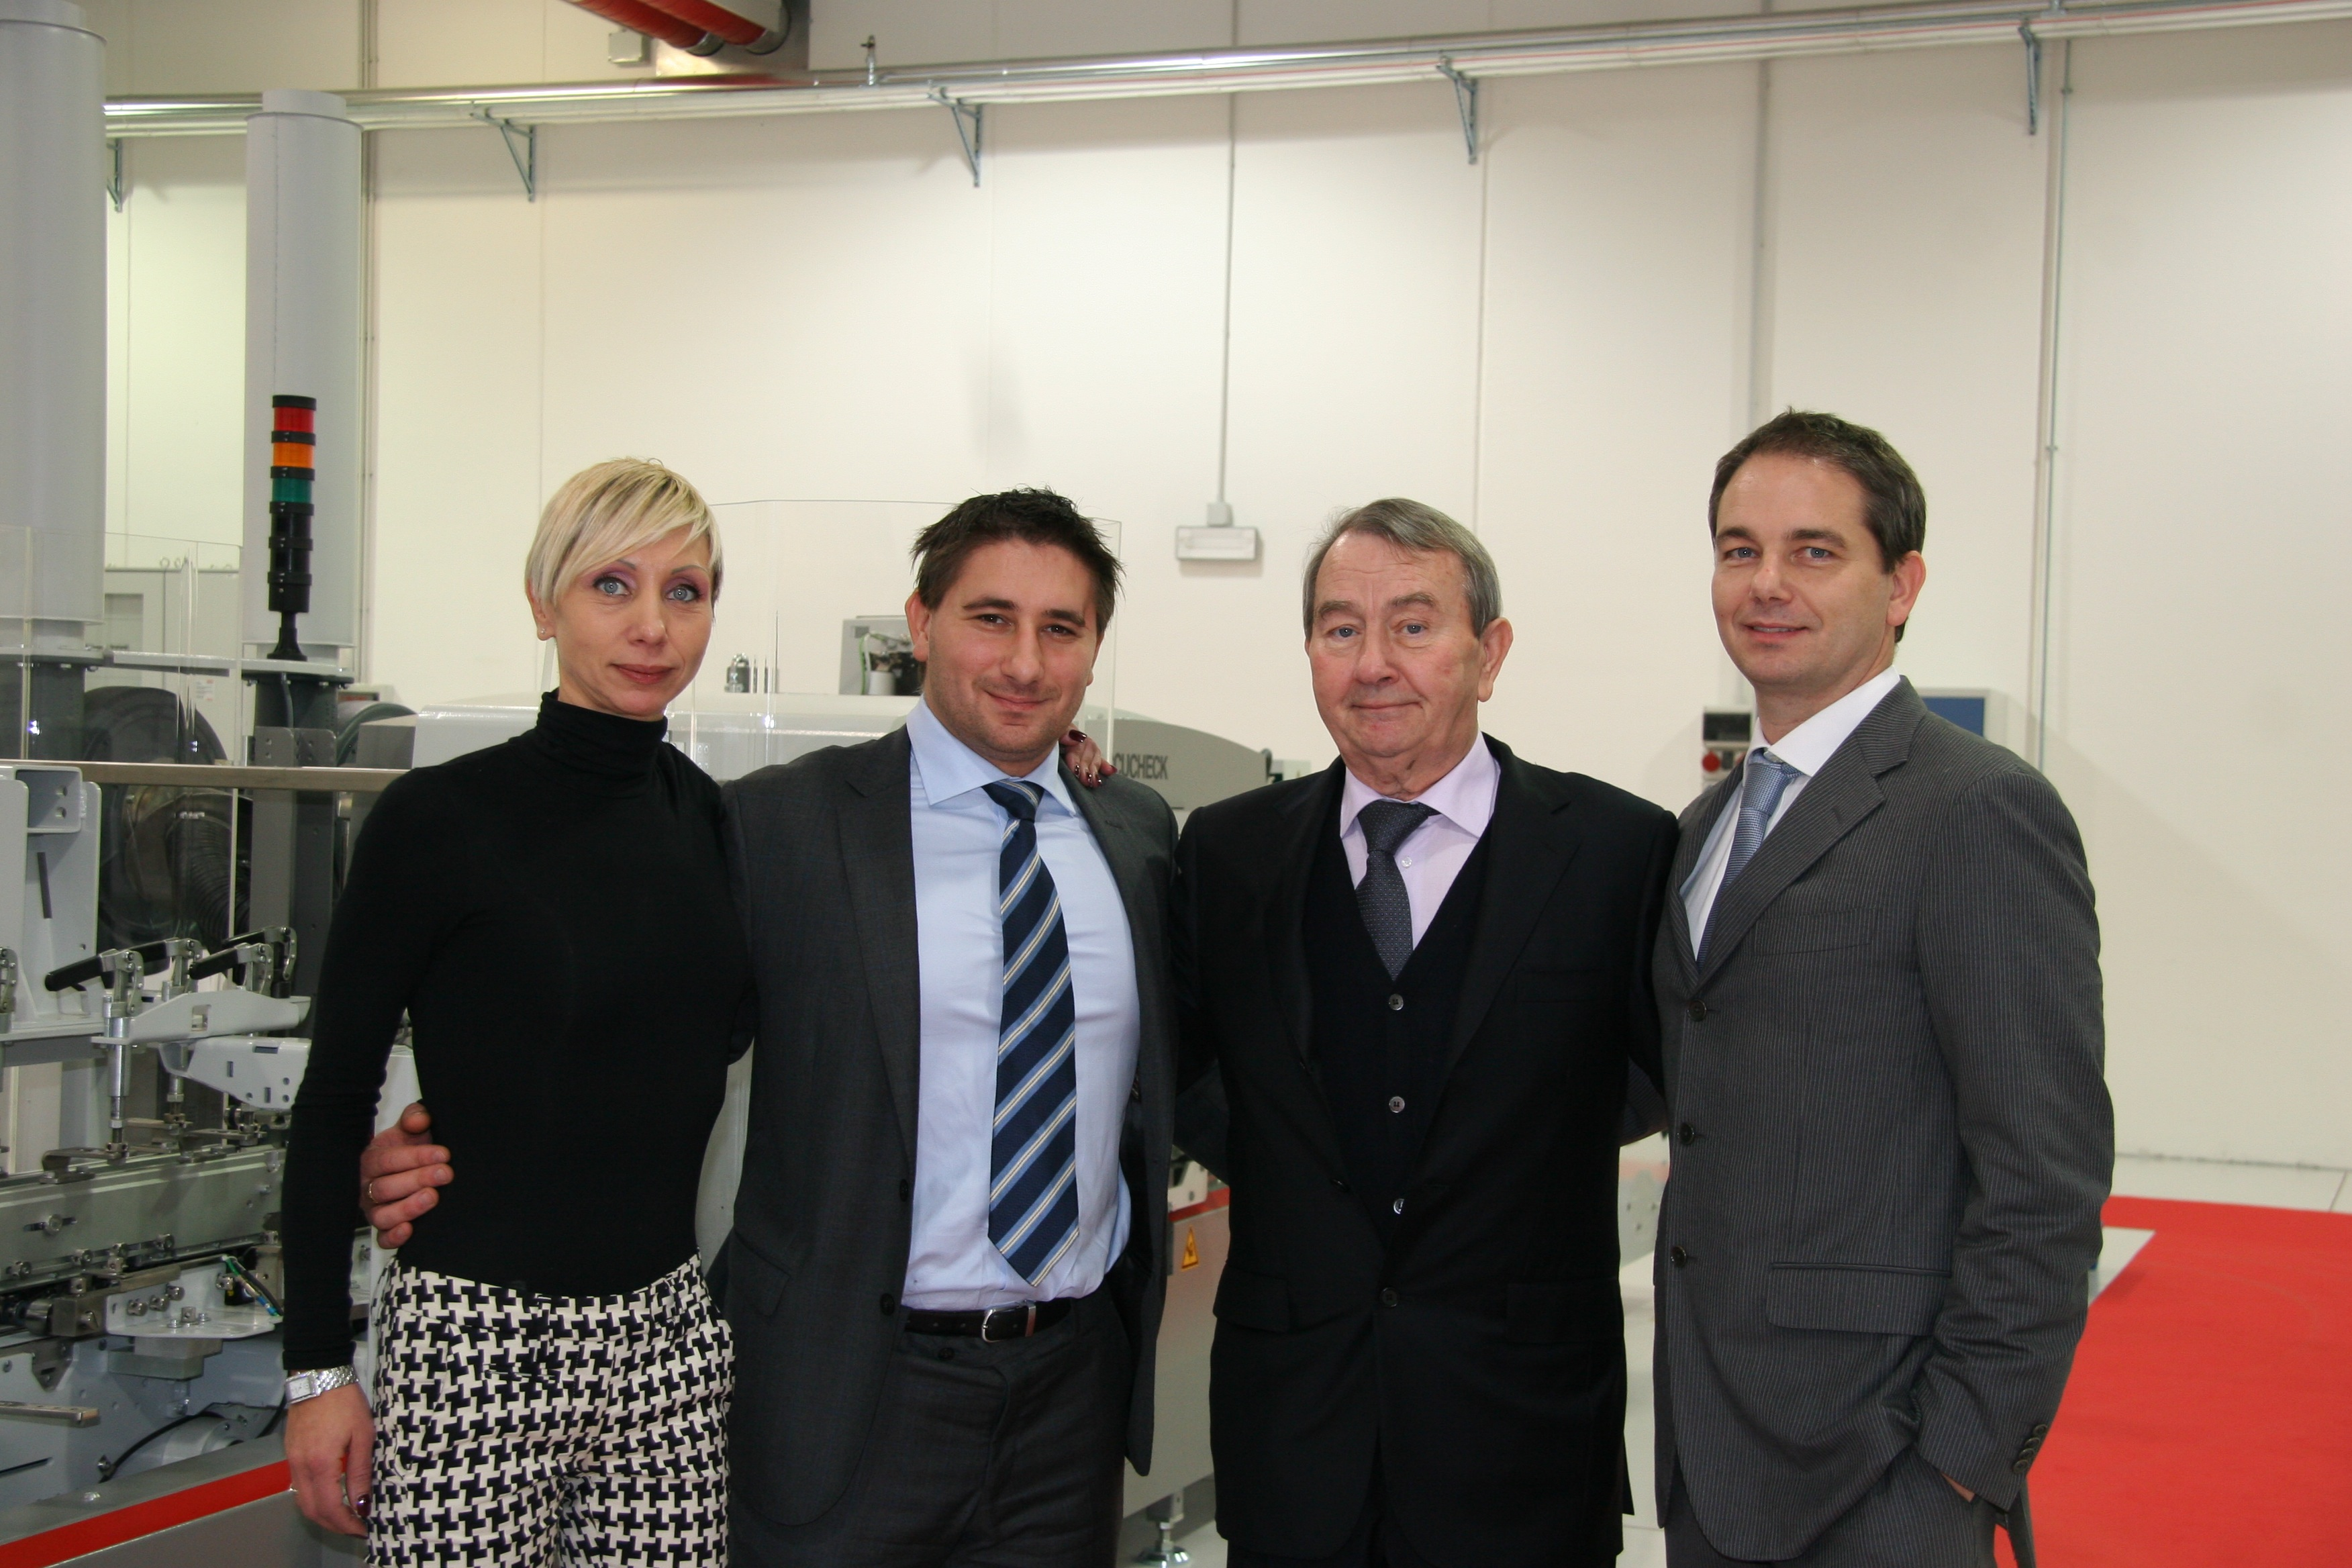 From the left, Ms Elisabetta Bressan (lawyer, Legal Department), Mr Michel Bressan (engineer, R&D), Mr Dino Bressan (Founder), Mr Alessio Bressan (Igb President)